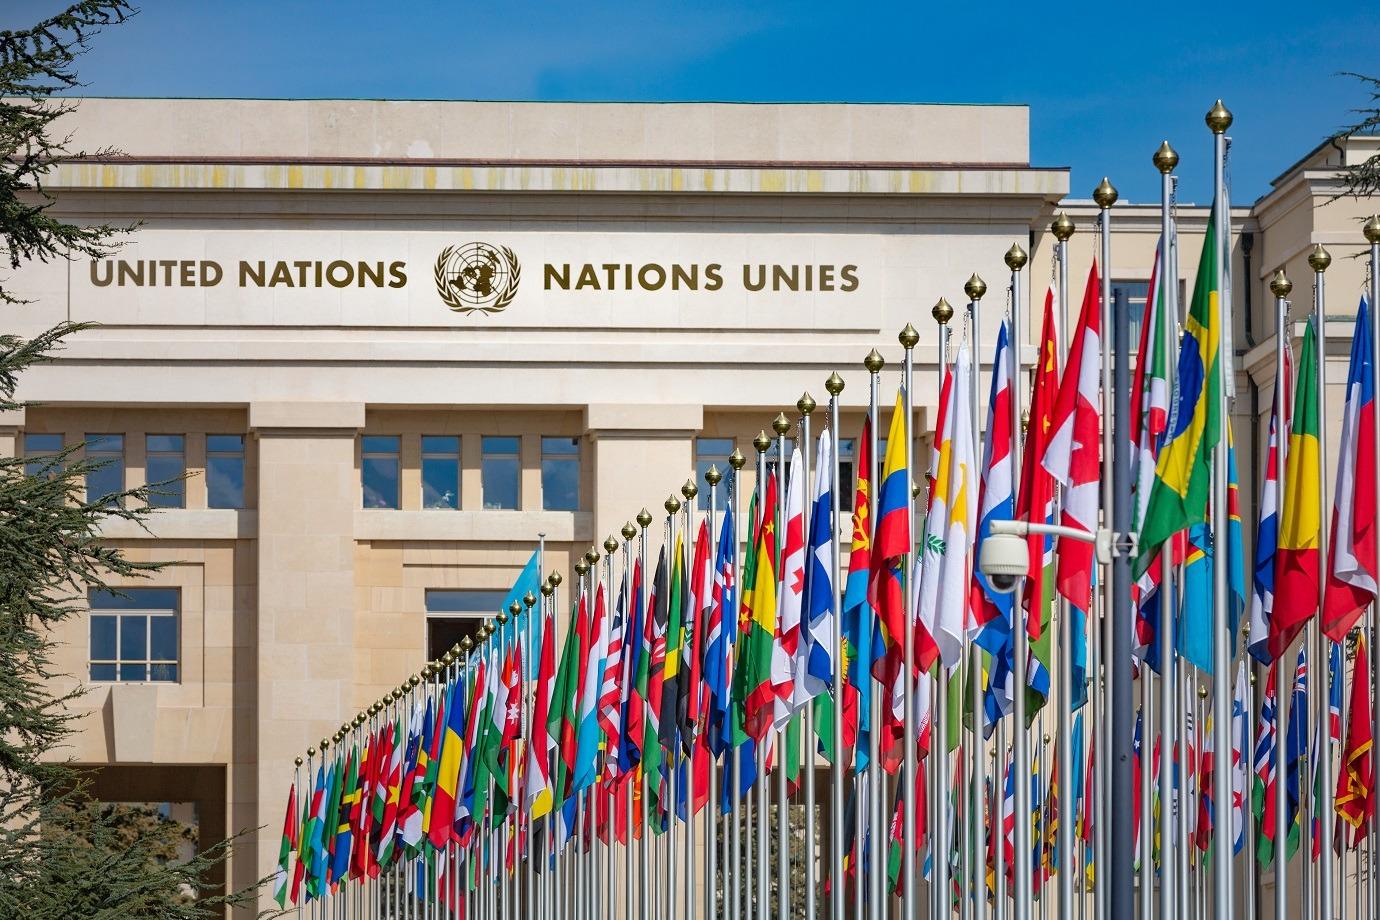 В Ташкенте будет подписана Программа ООН по наркотикам и преступности на 2022-2025 годы